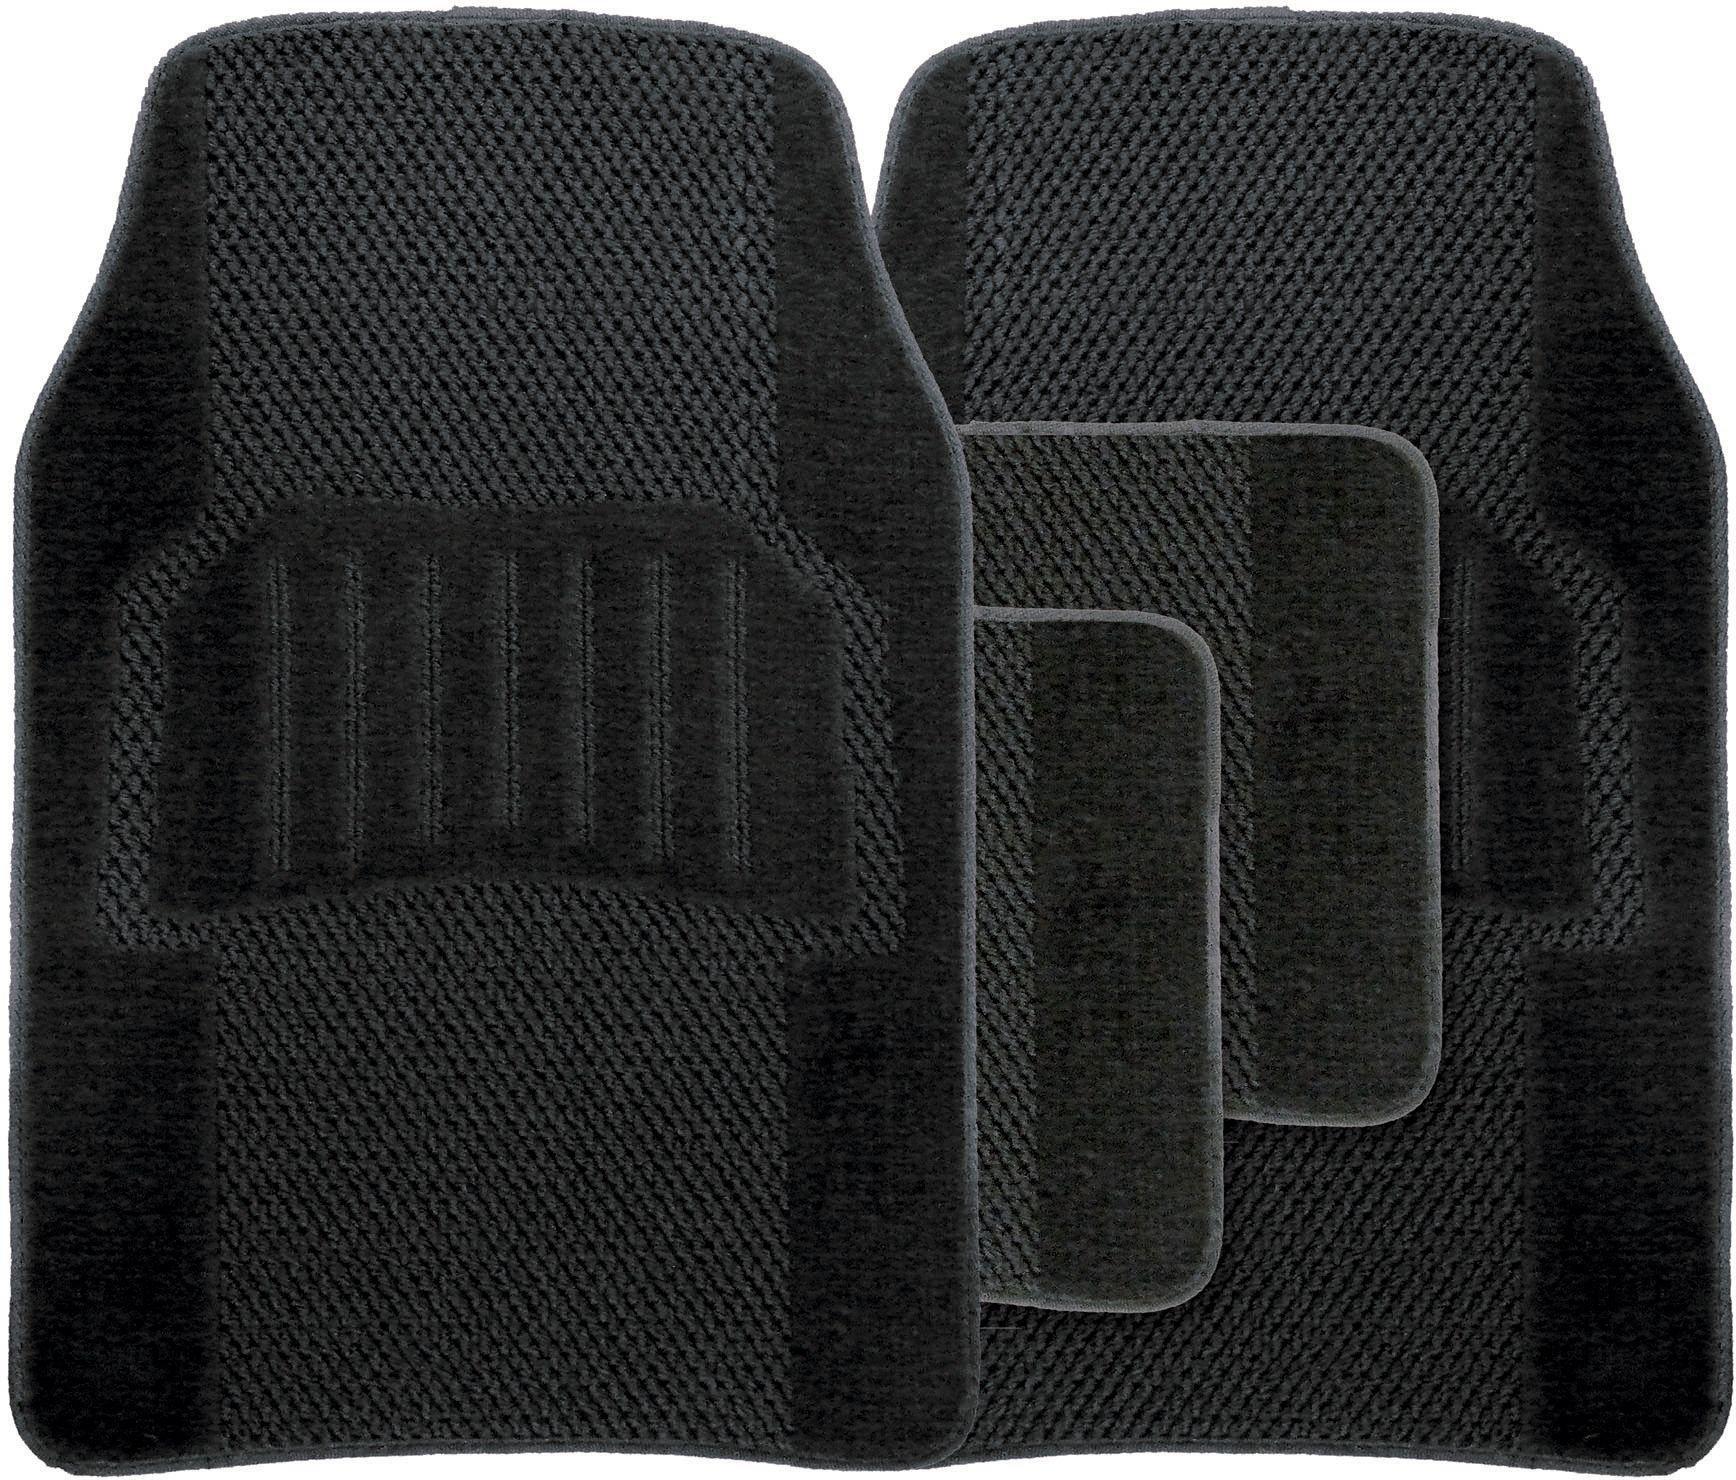 Image of Streetwize - 4 Piece Universal Premium Car Mats Set - Black